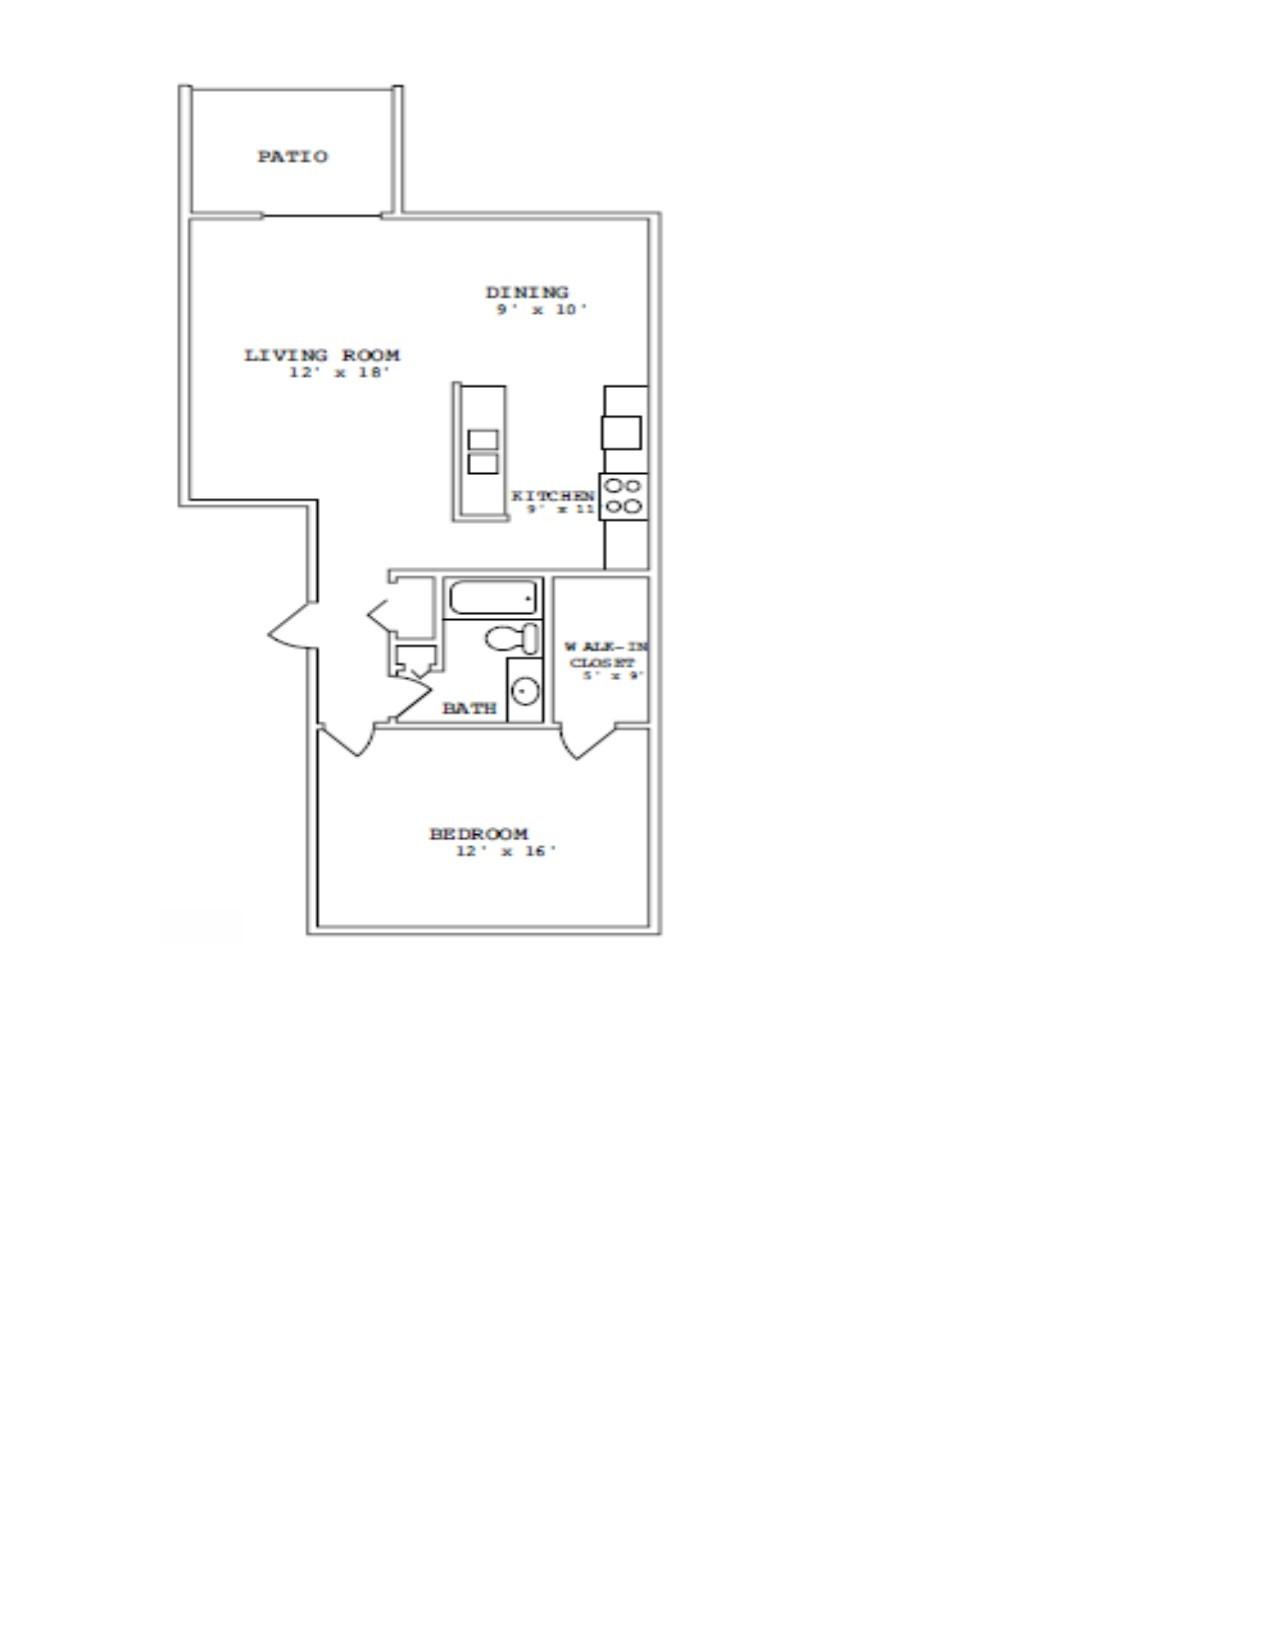 880-03 Floorplan